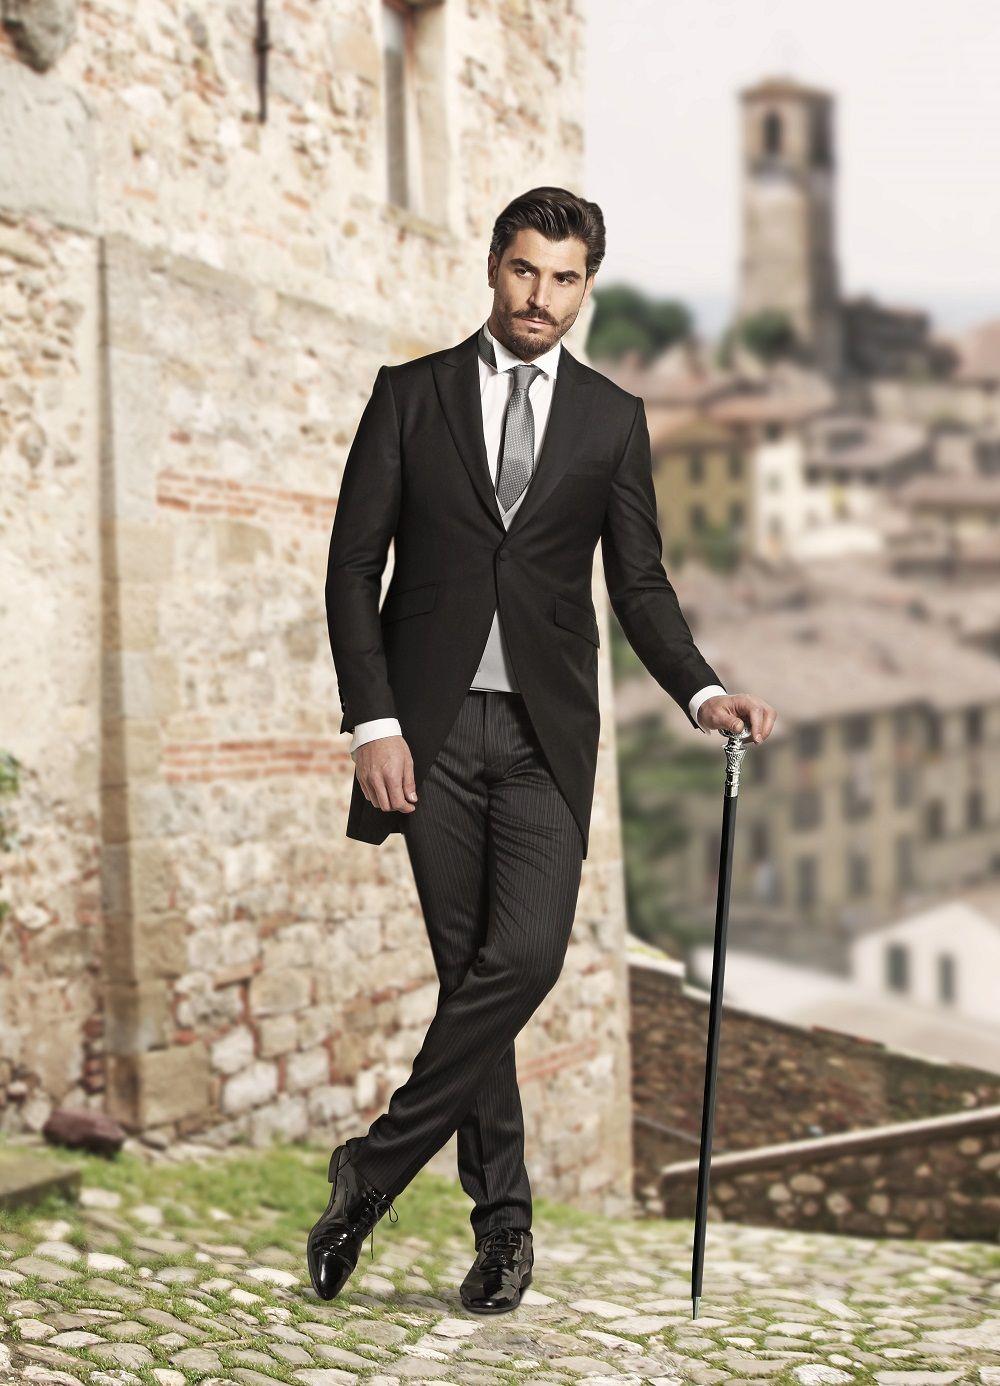 Abito Matrimonio Uomo Tight : Miramode tricesimo abito tight uomo giuseppe rocchini